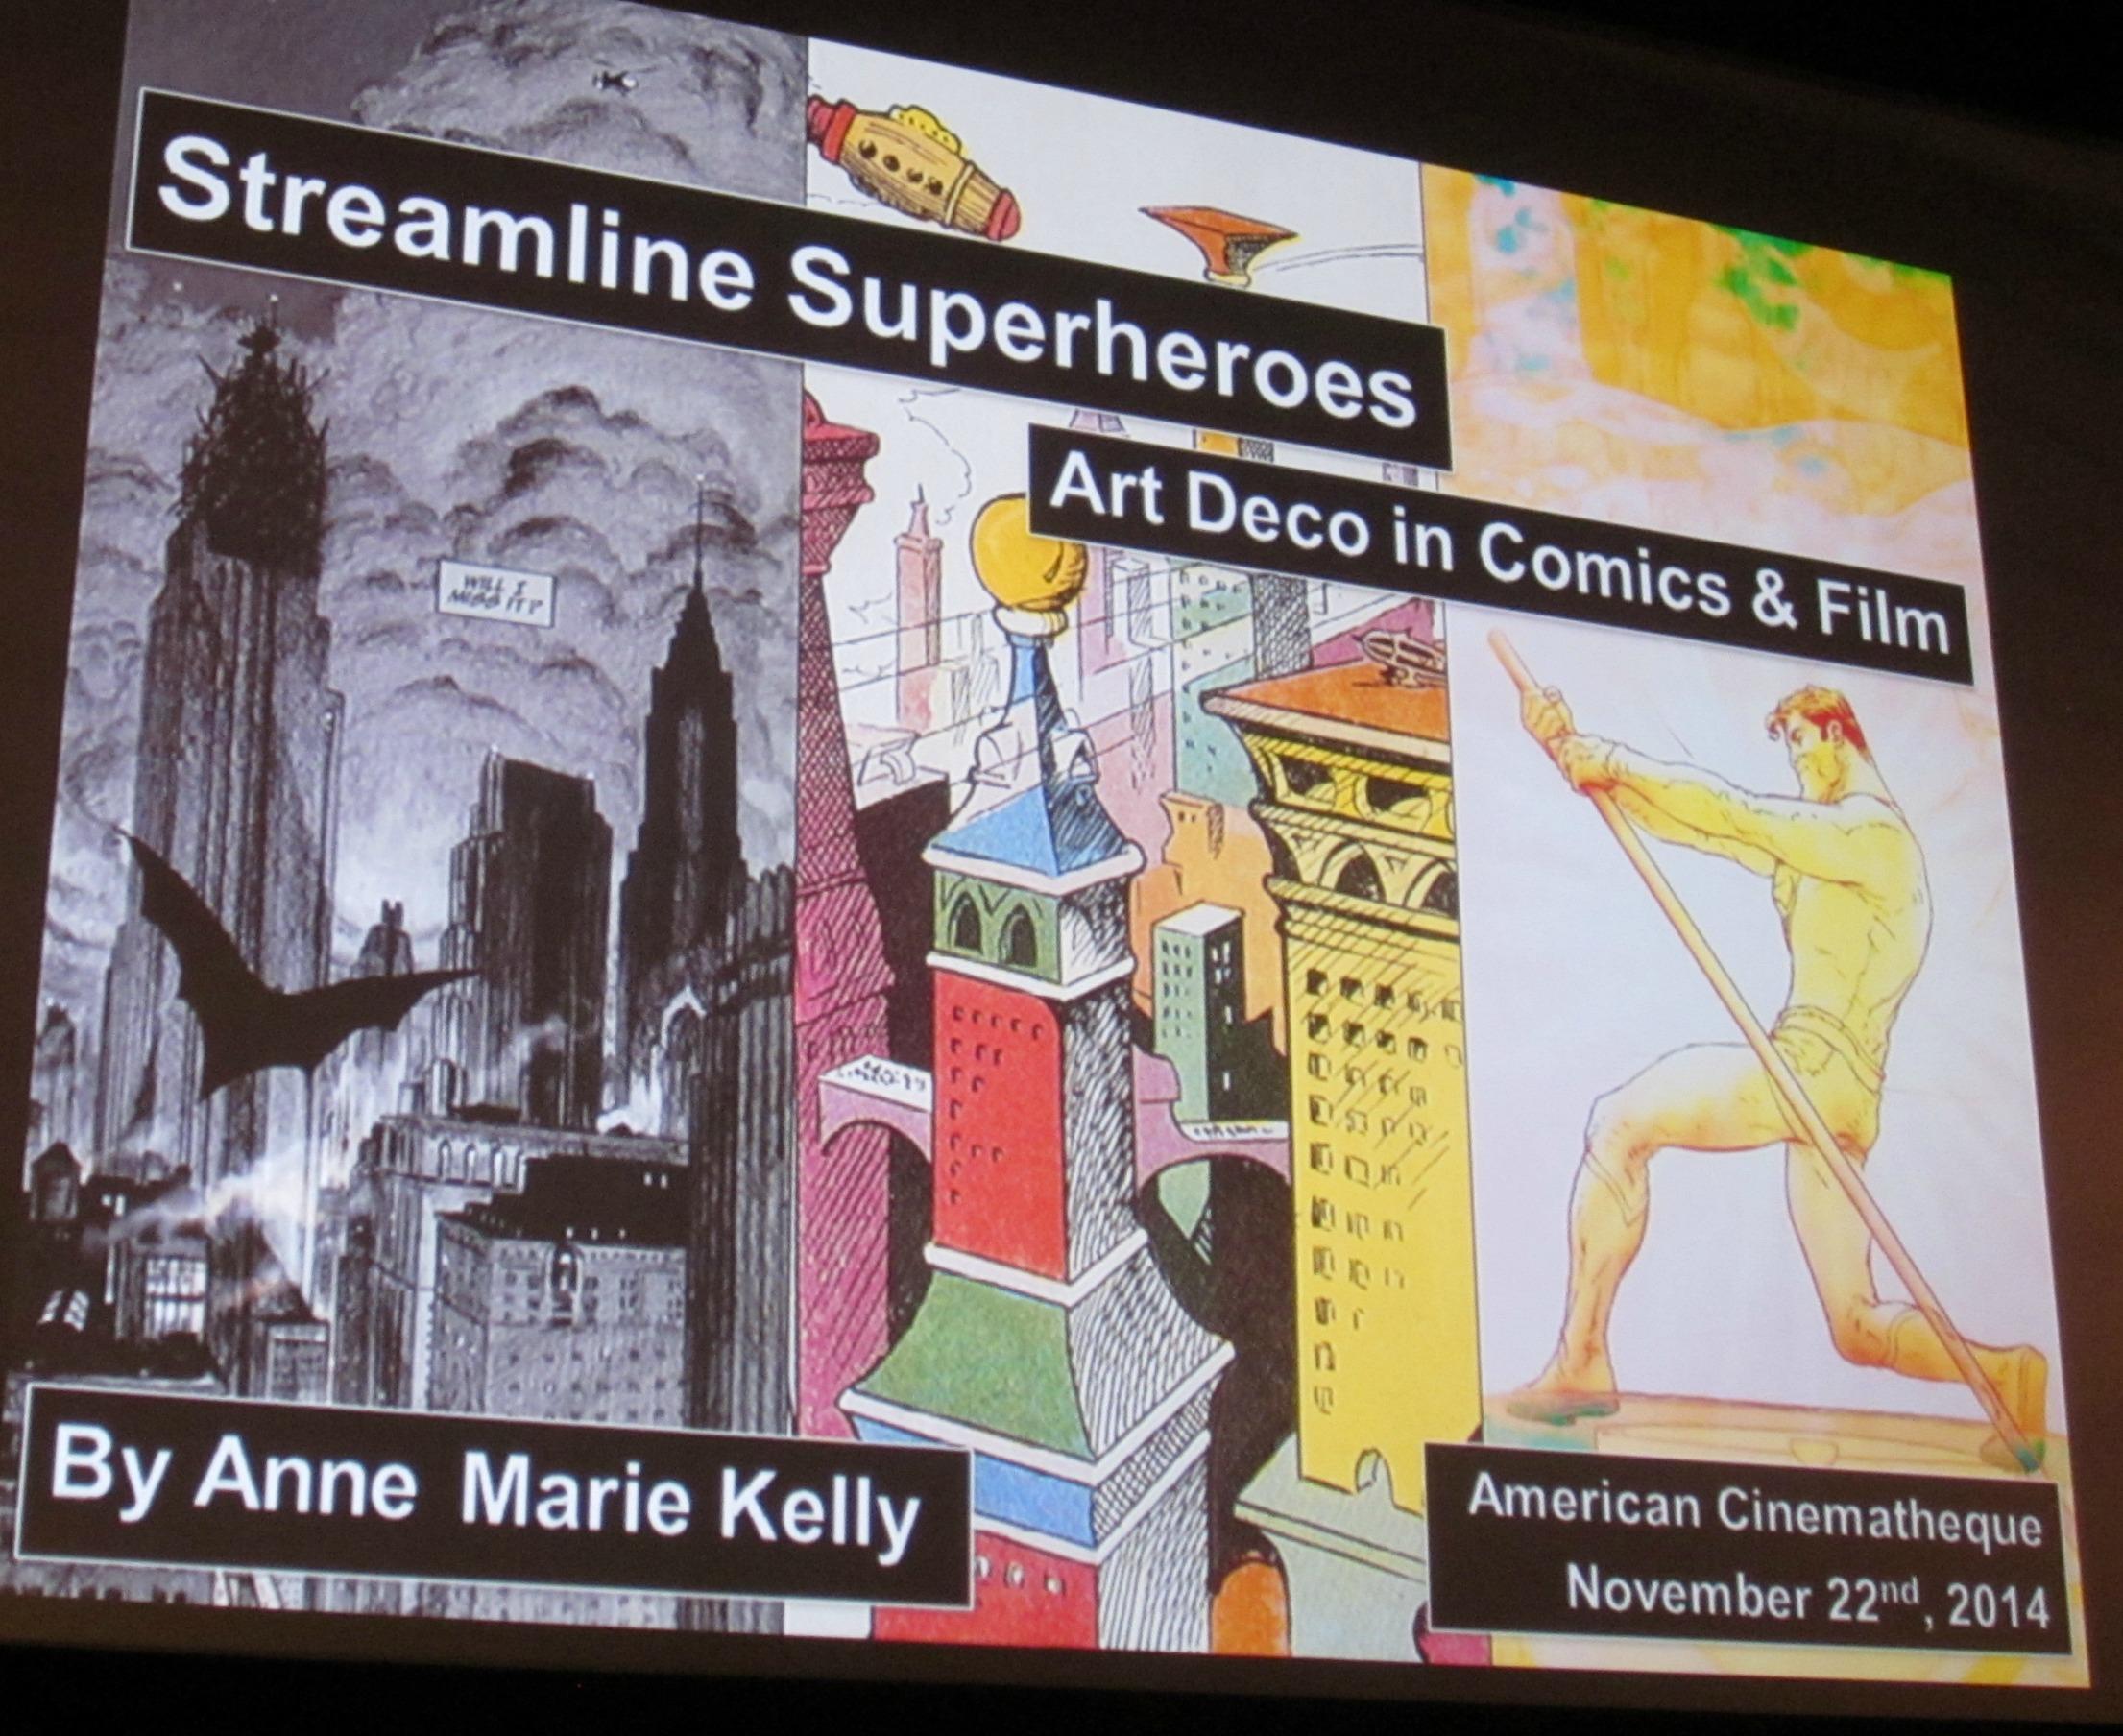 Comic Books and Art Deco Lecture